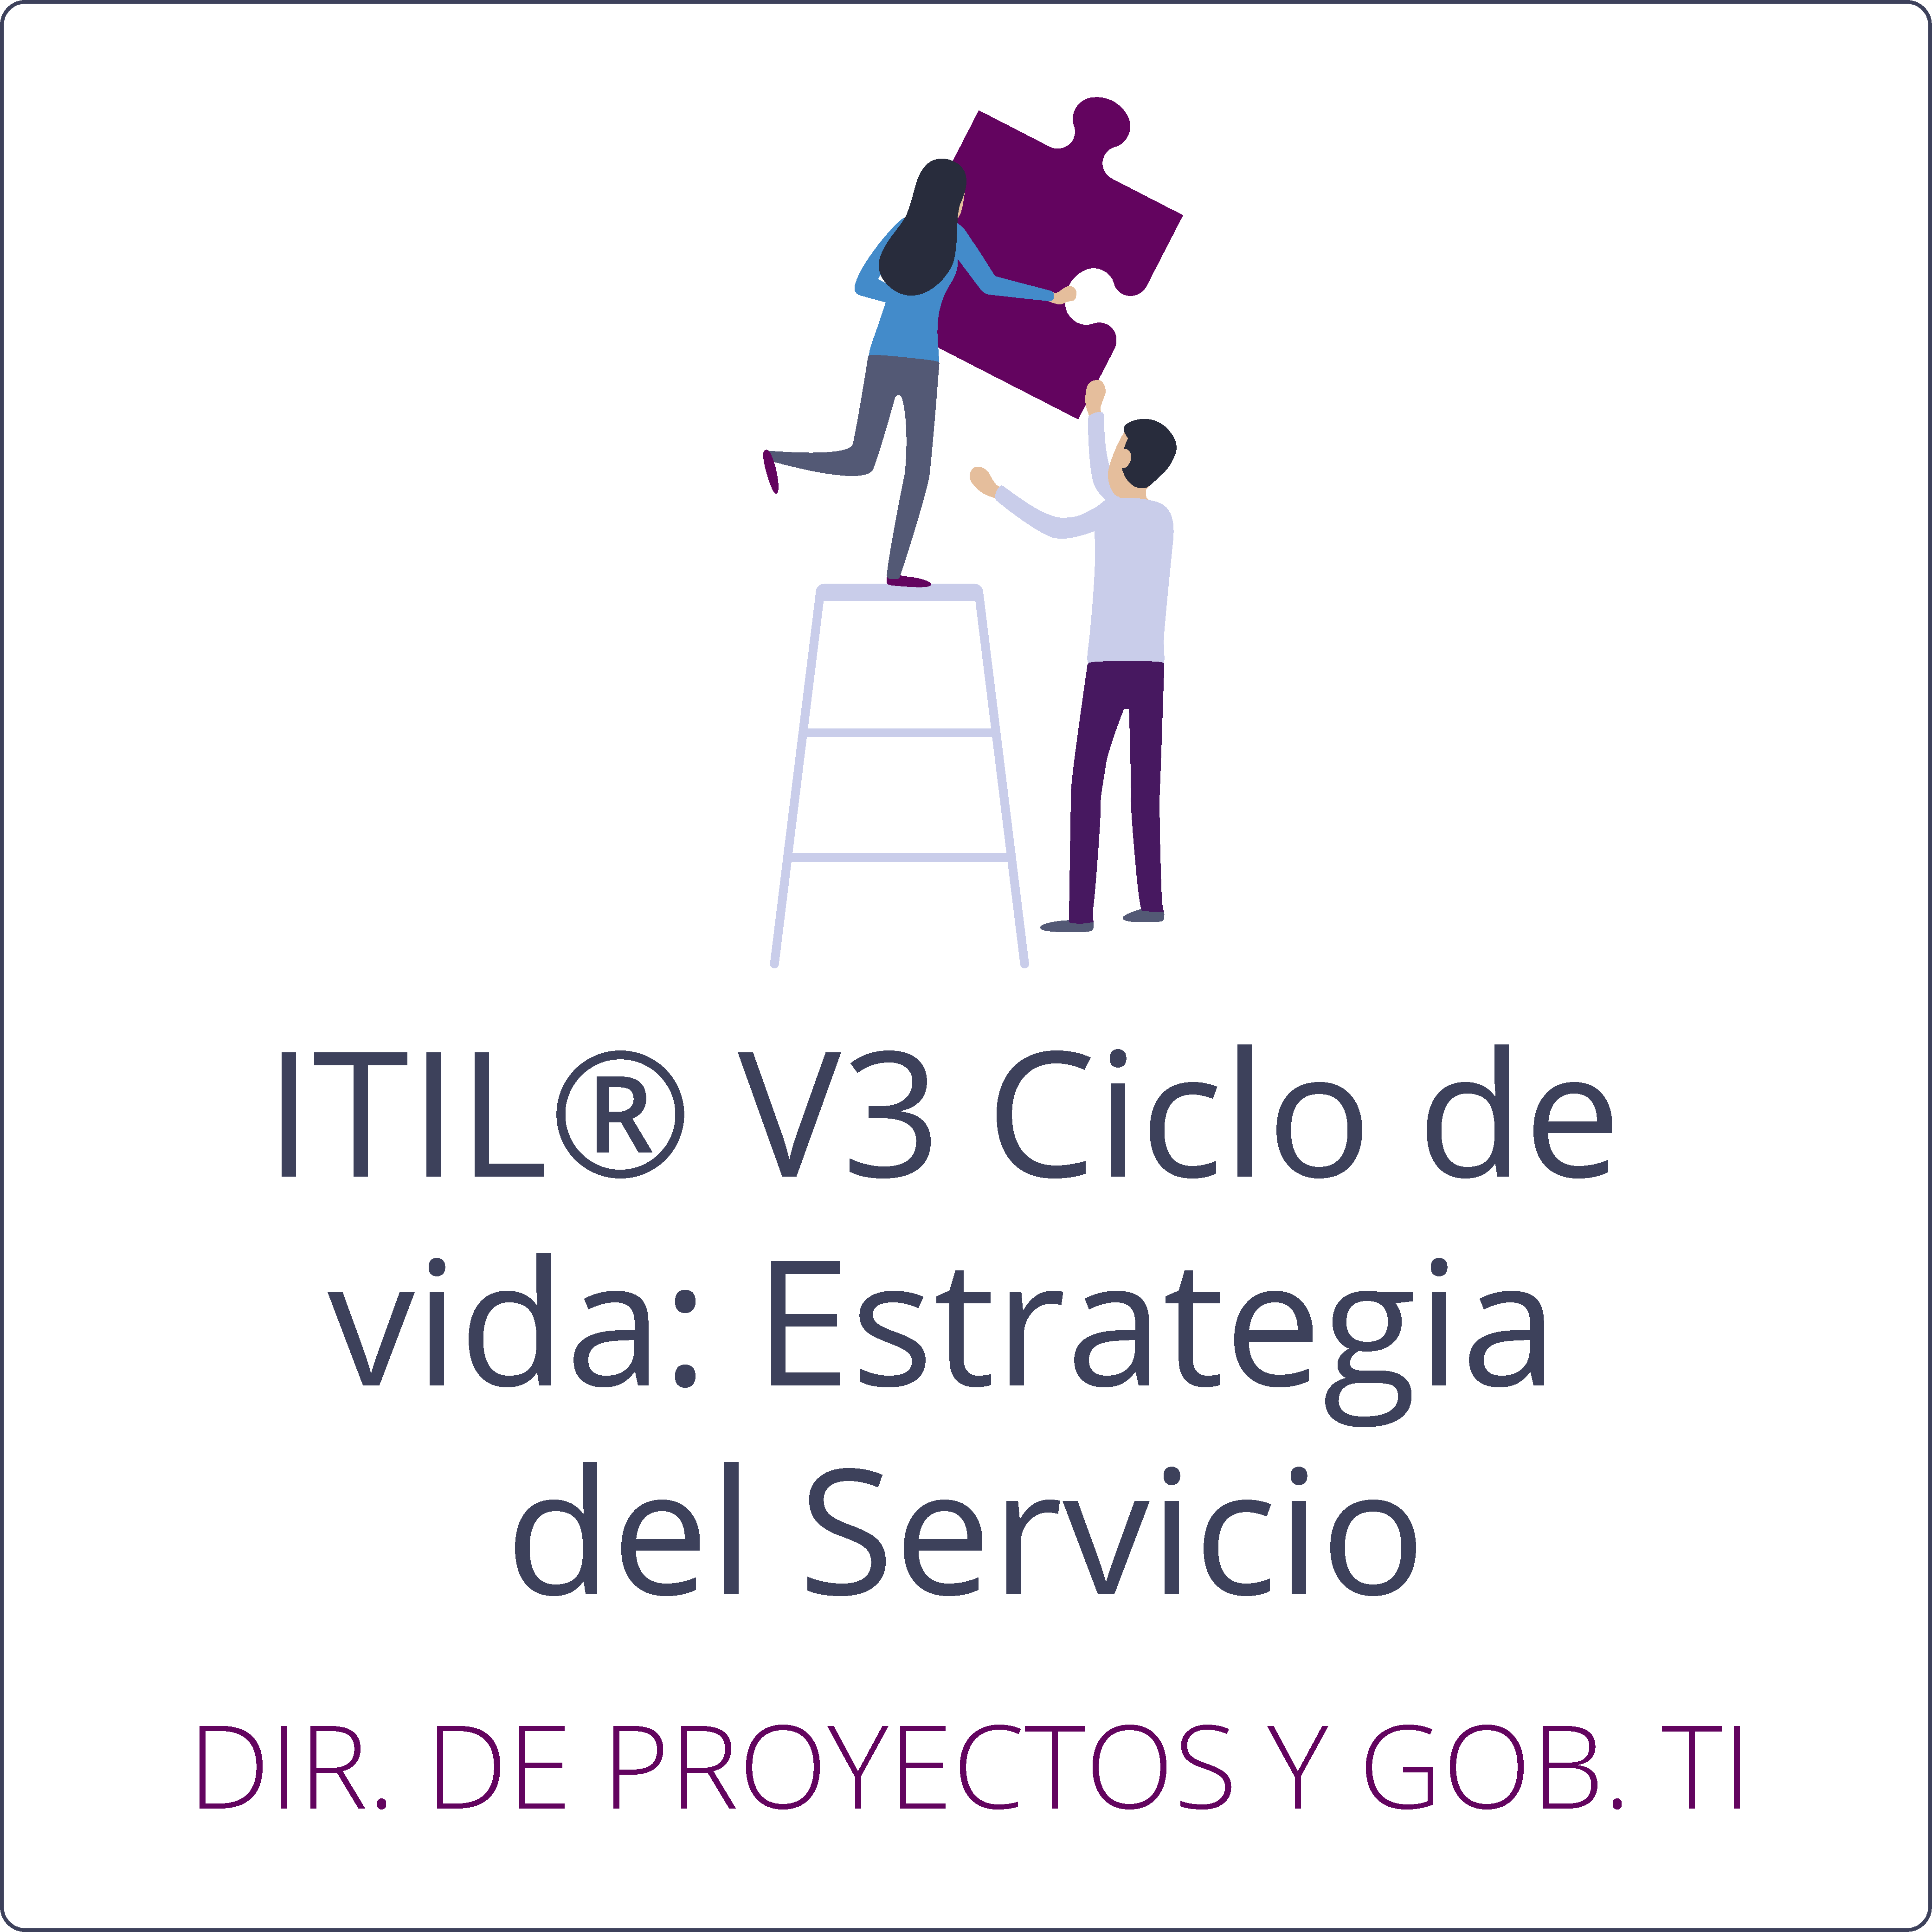 ITIL® V3, Ciclo de vida: Estrategia del Servicio